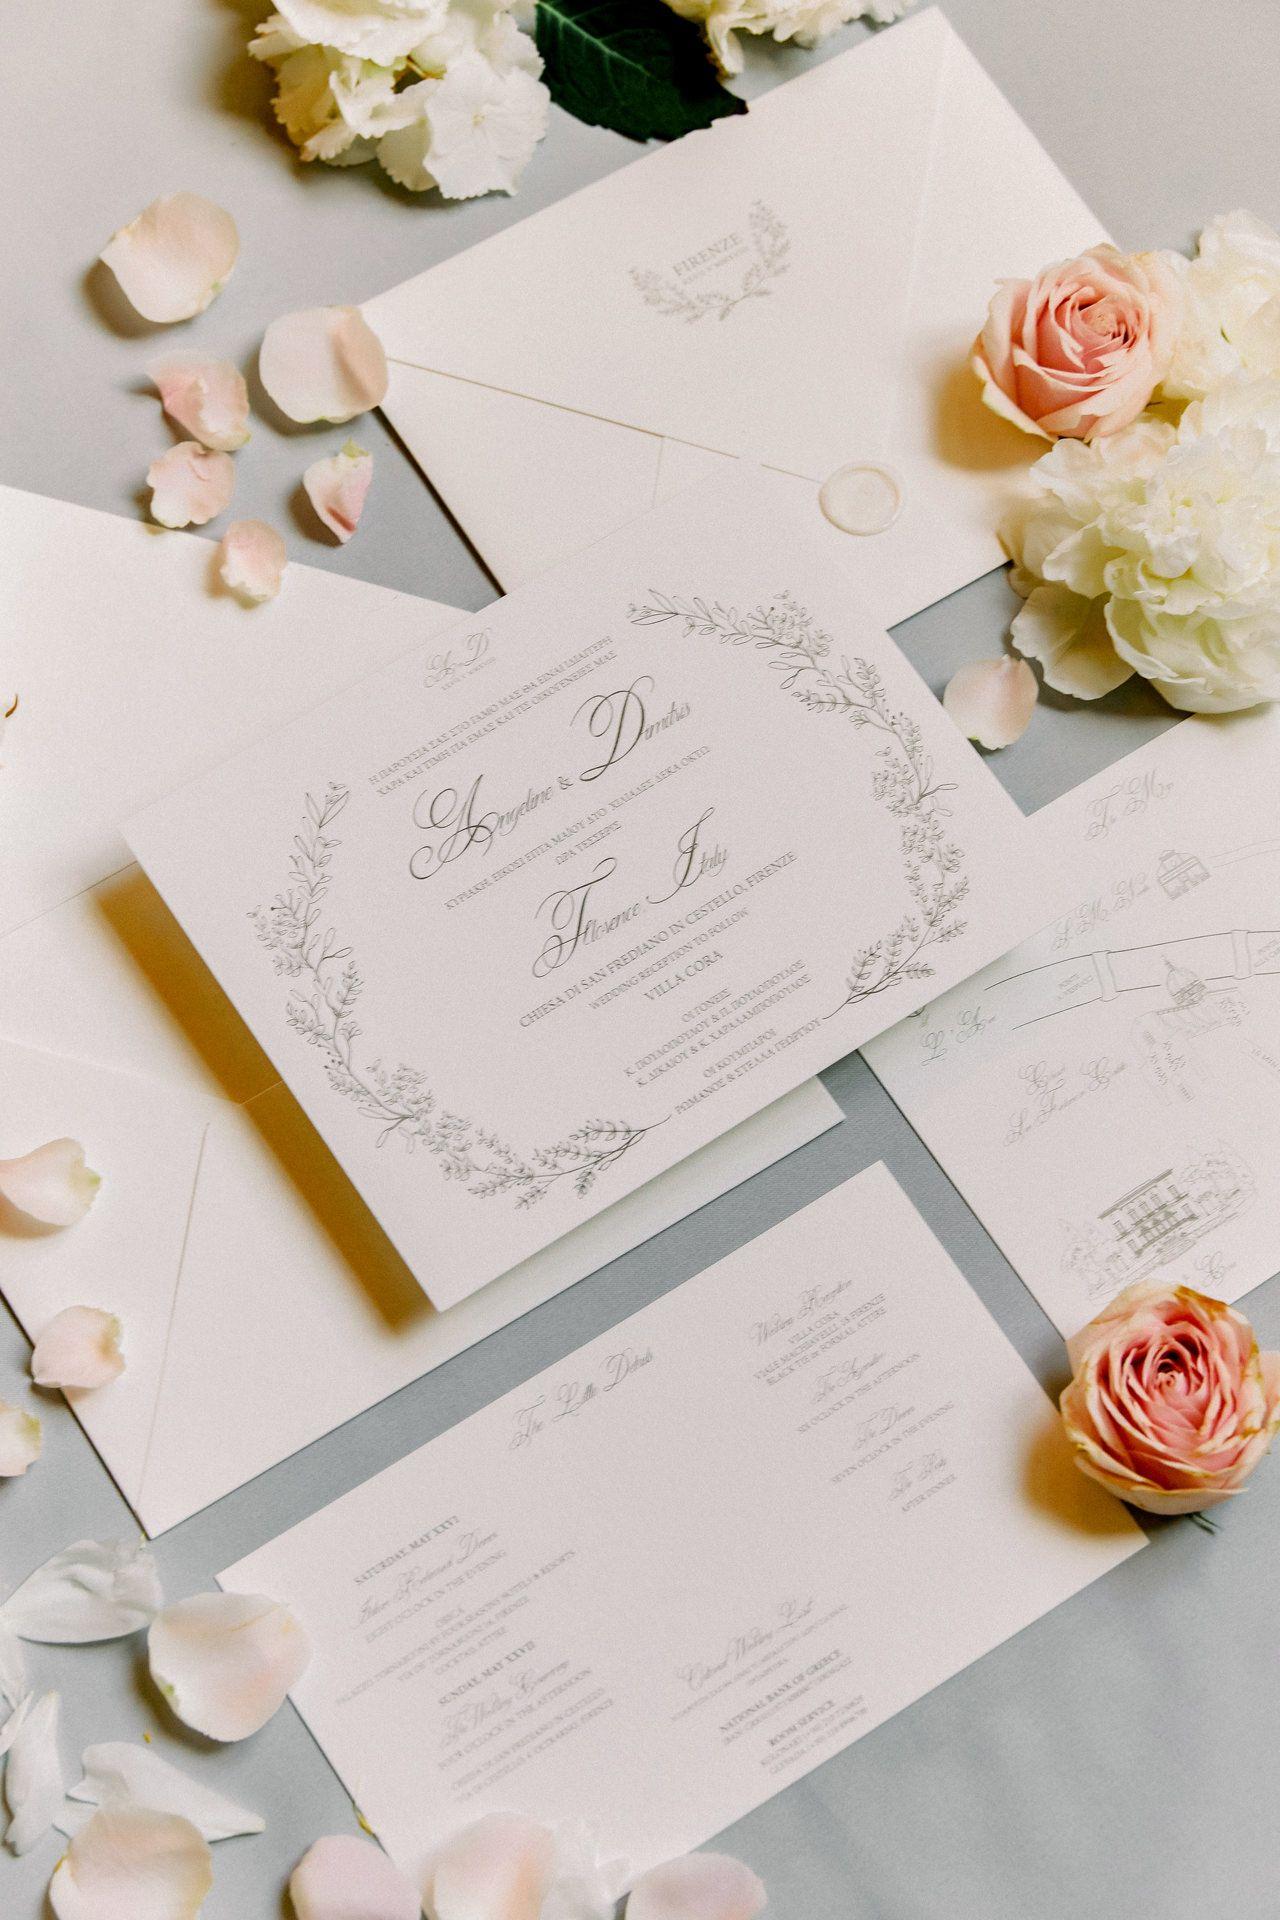 A Luxury Wedding In Florence Italy Sotiris Tsakanikas Photography In 2020 Handmade Wedding Invitations Digital Wedding Invitations Custom Wedding Invitations